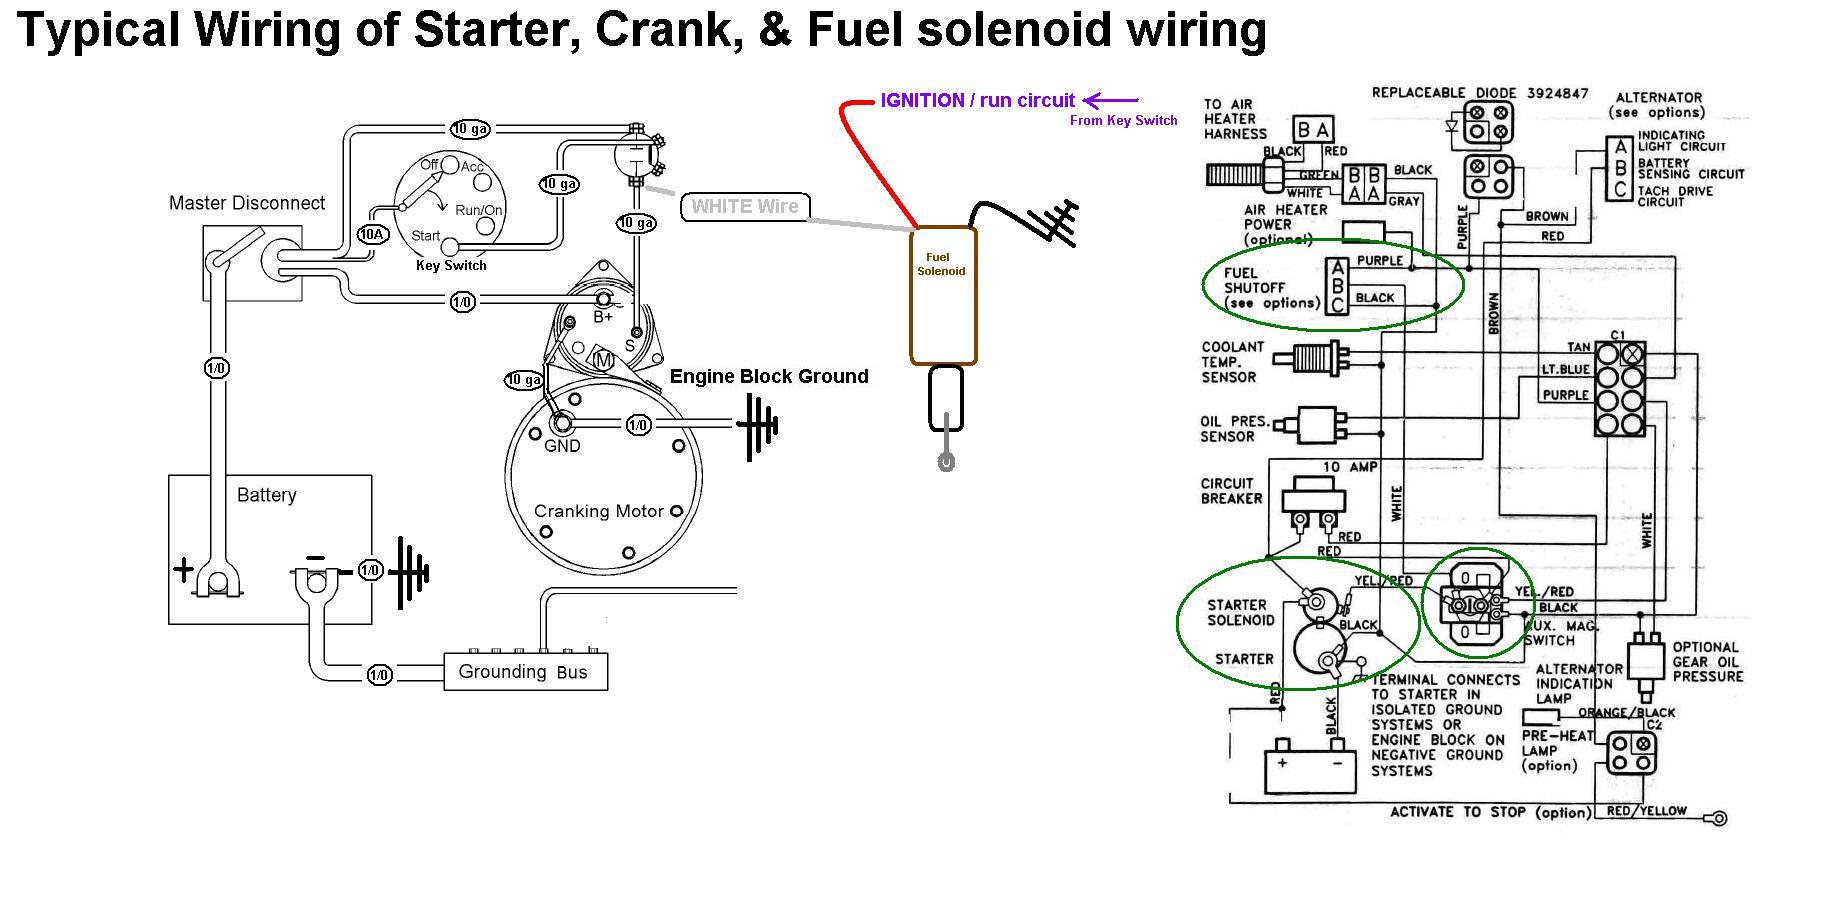 Bv 7924 Yanmar Starter Motor Diagram Free Download Wiring Diagram Schematic Free Diagram